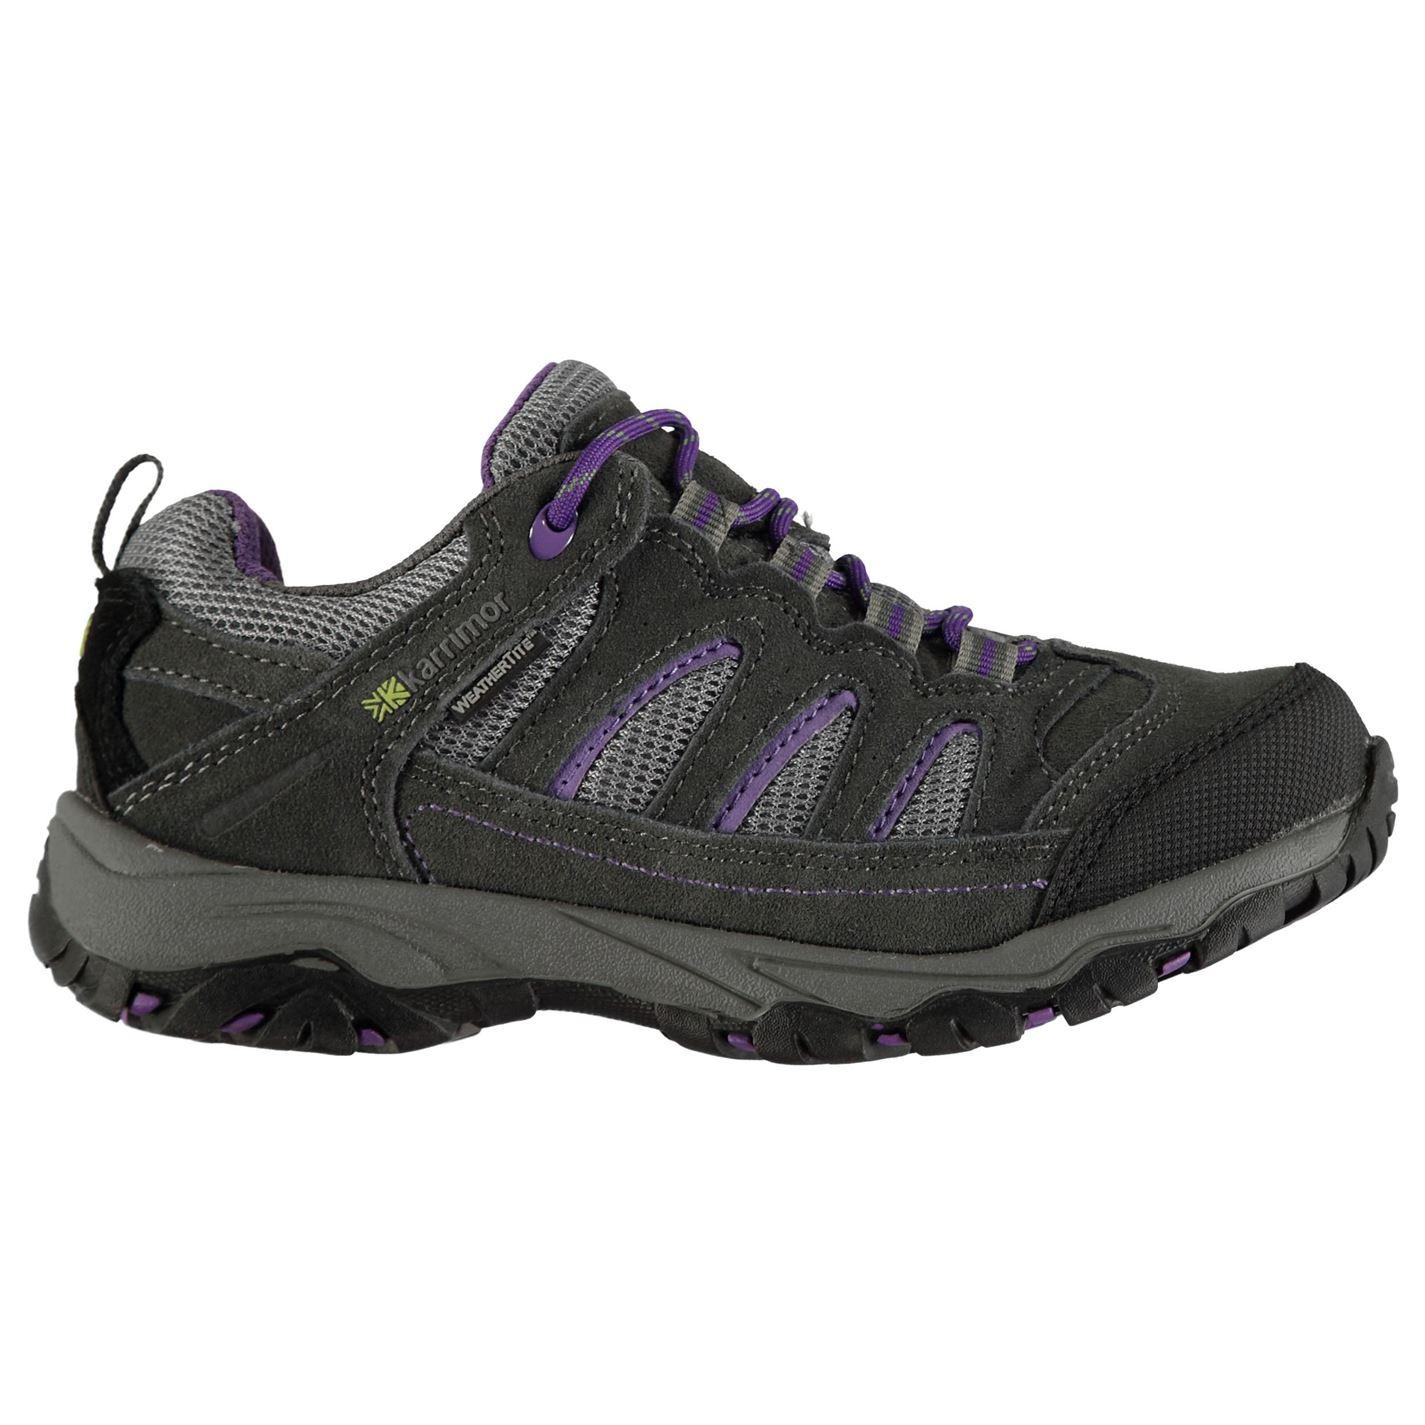 Karrimor Mount Low Childrens Walking Shoes